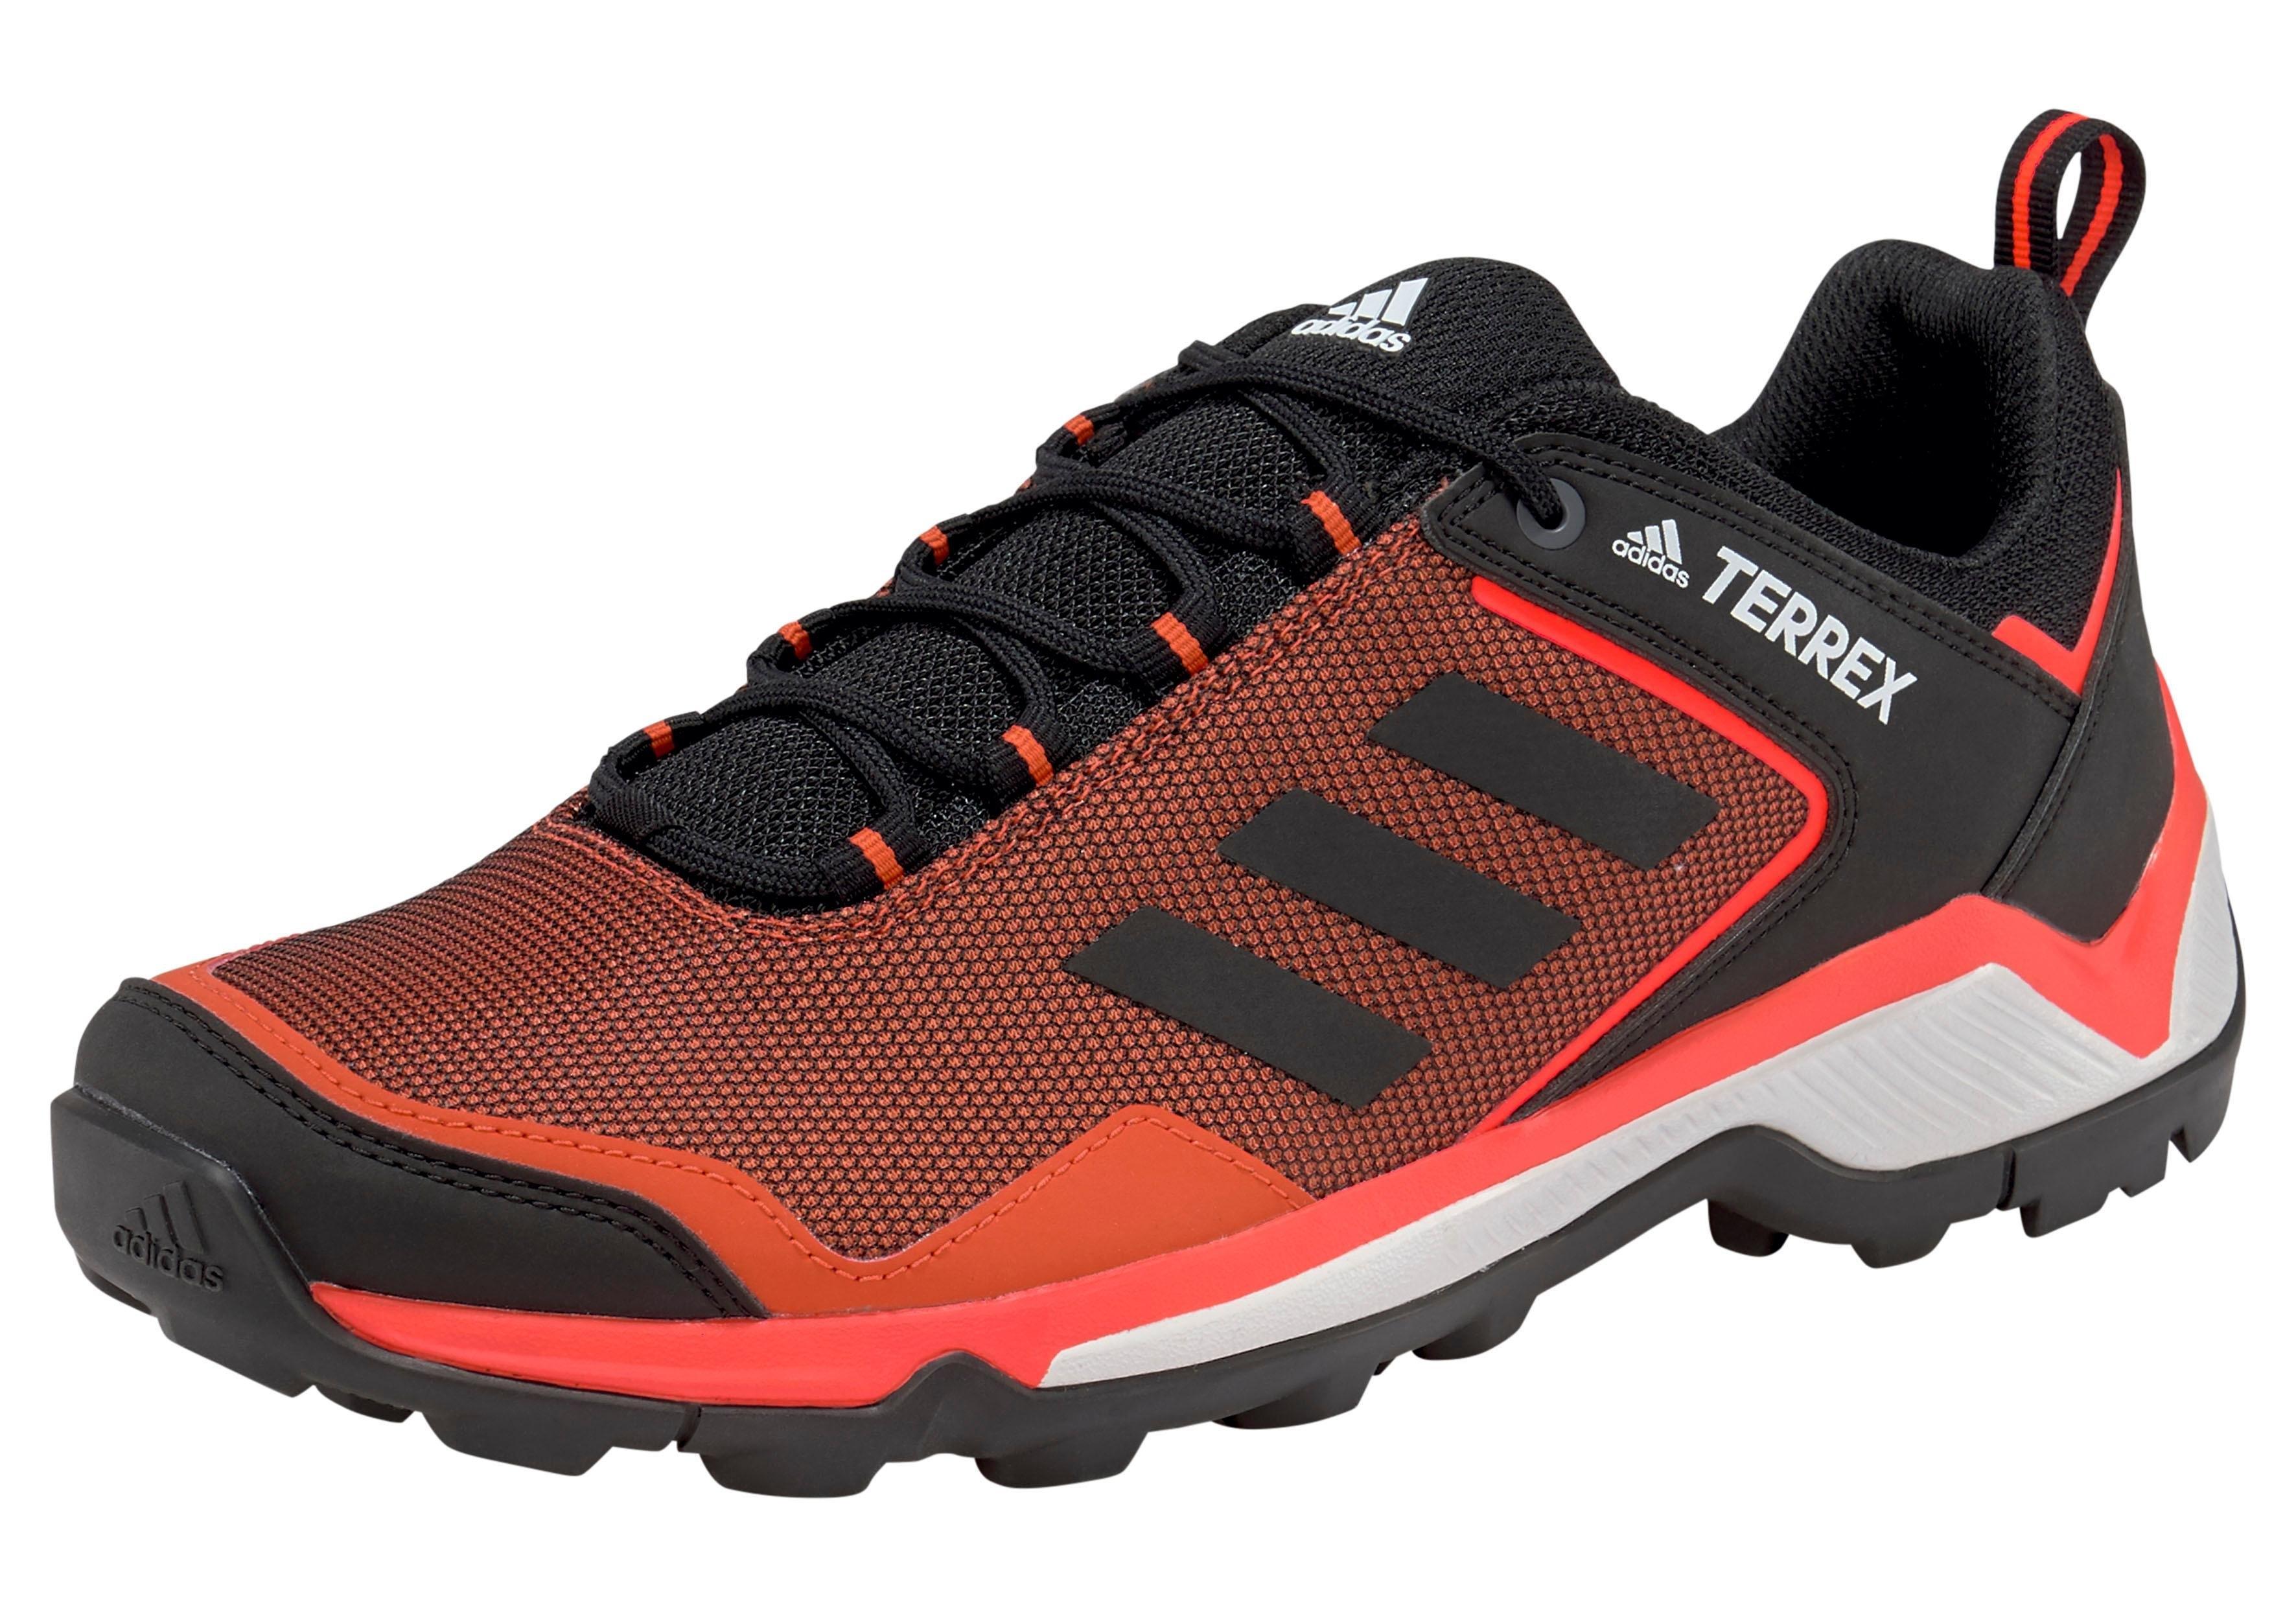 Adidas Terrex adidas Performance runningschoenen »Terrex Eastrail« online kopen op otto.nl